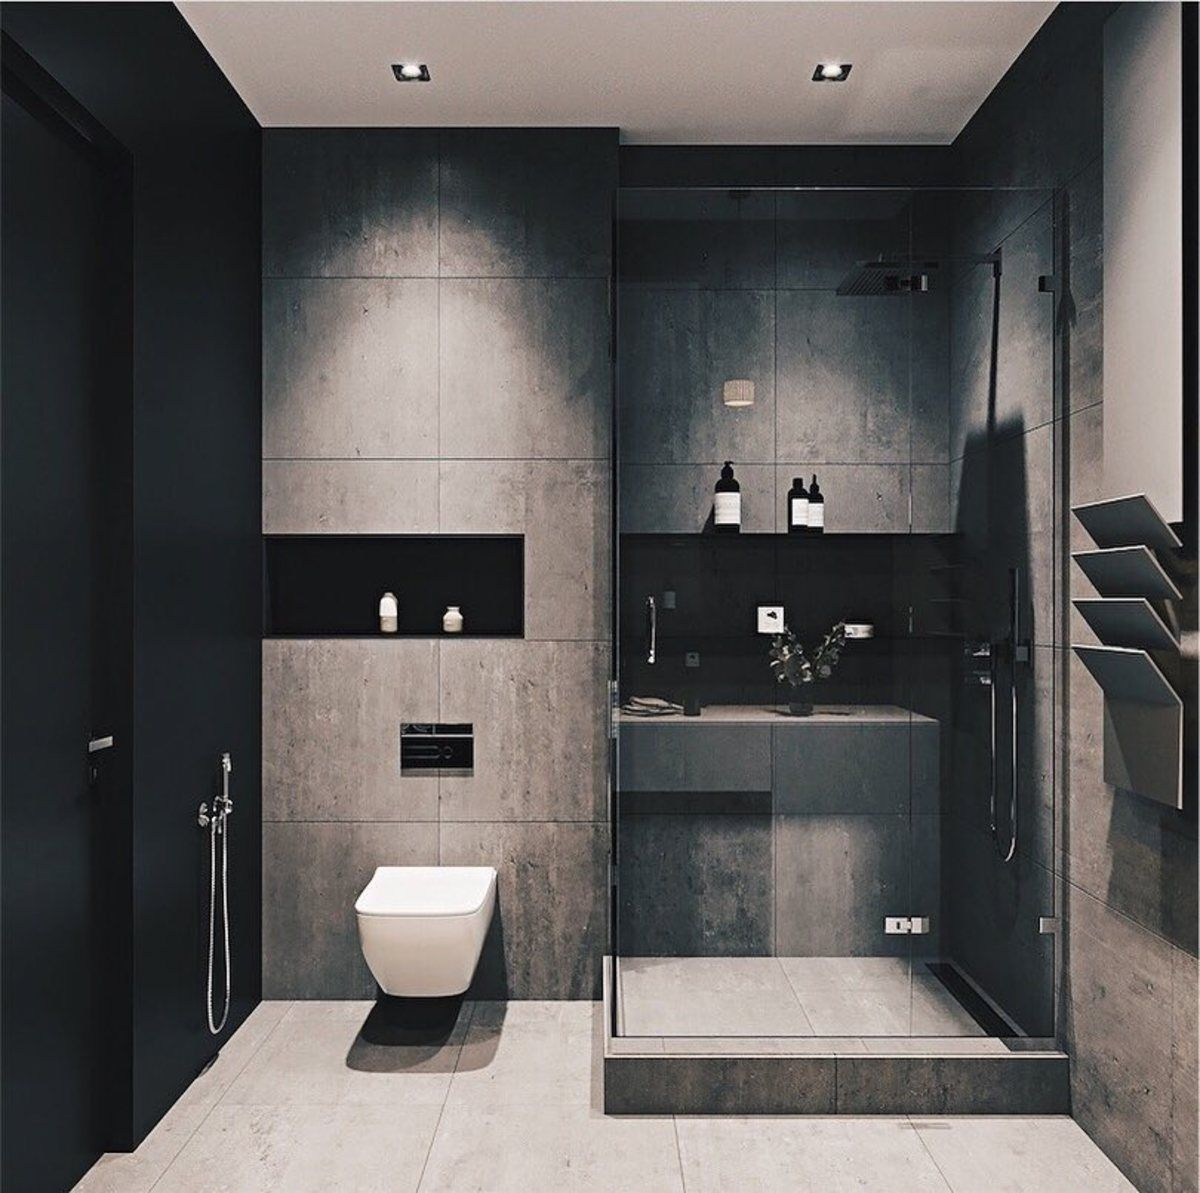 random inspiration 336 bathroom design small washroom on home inspirations this year the perfect dream bathrooms diy bathroom ideas id=24086